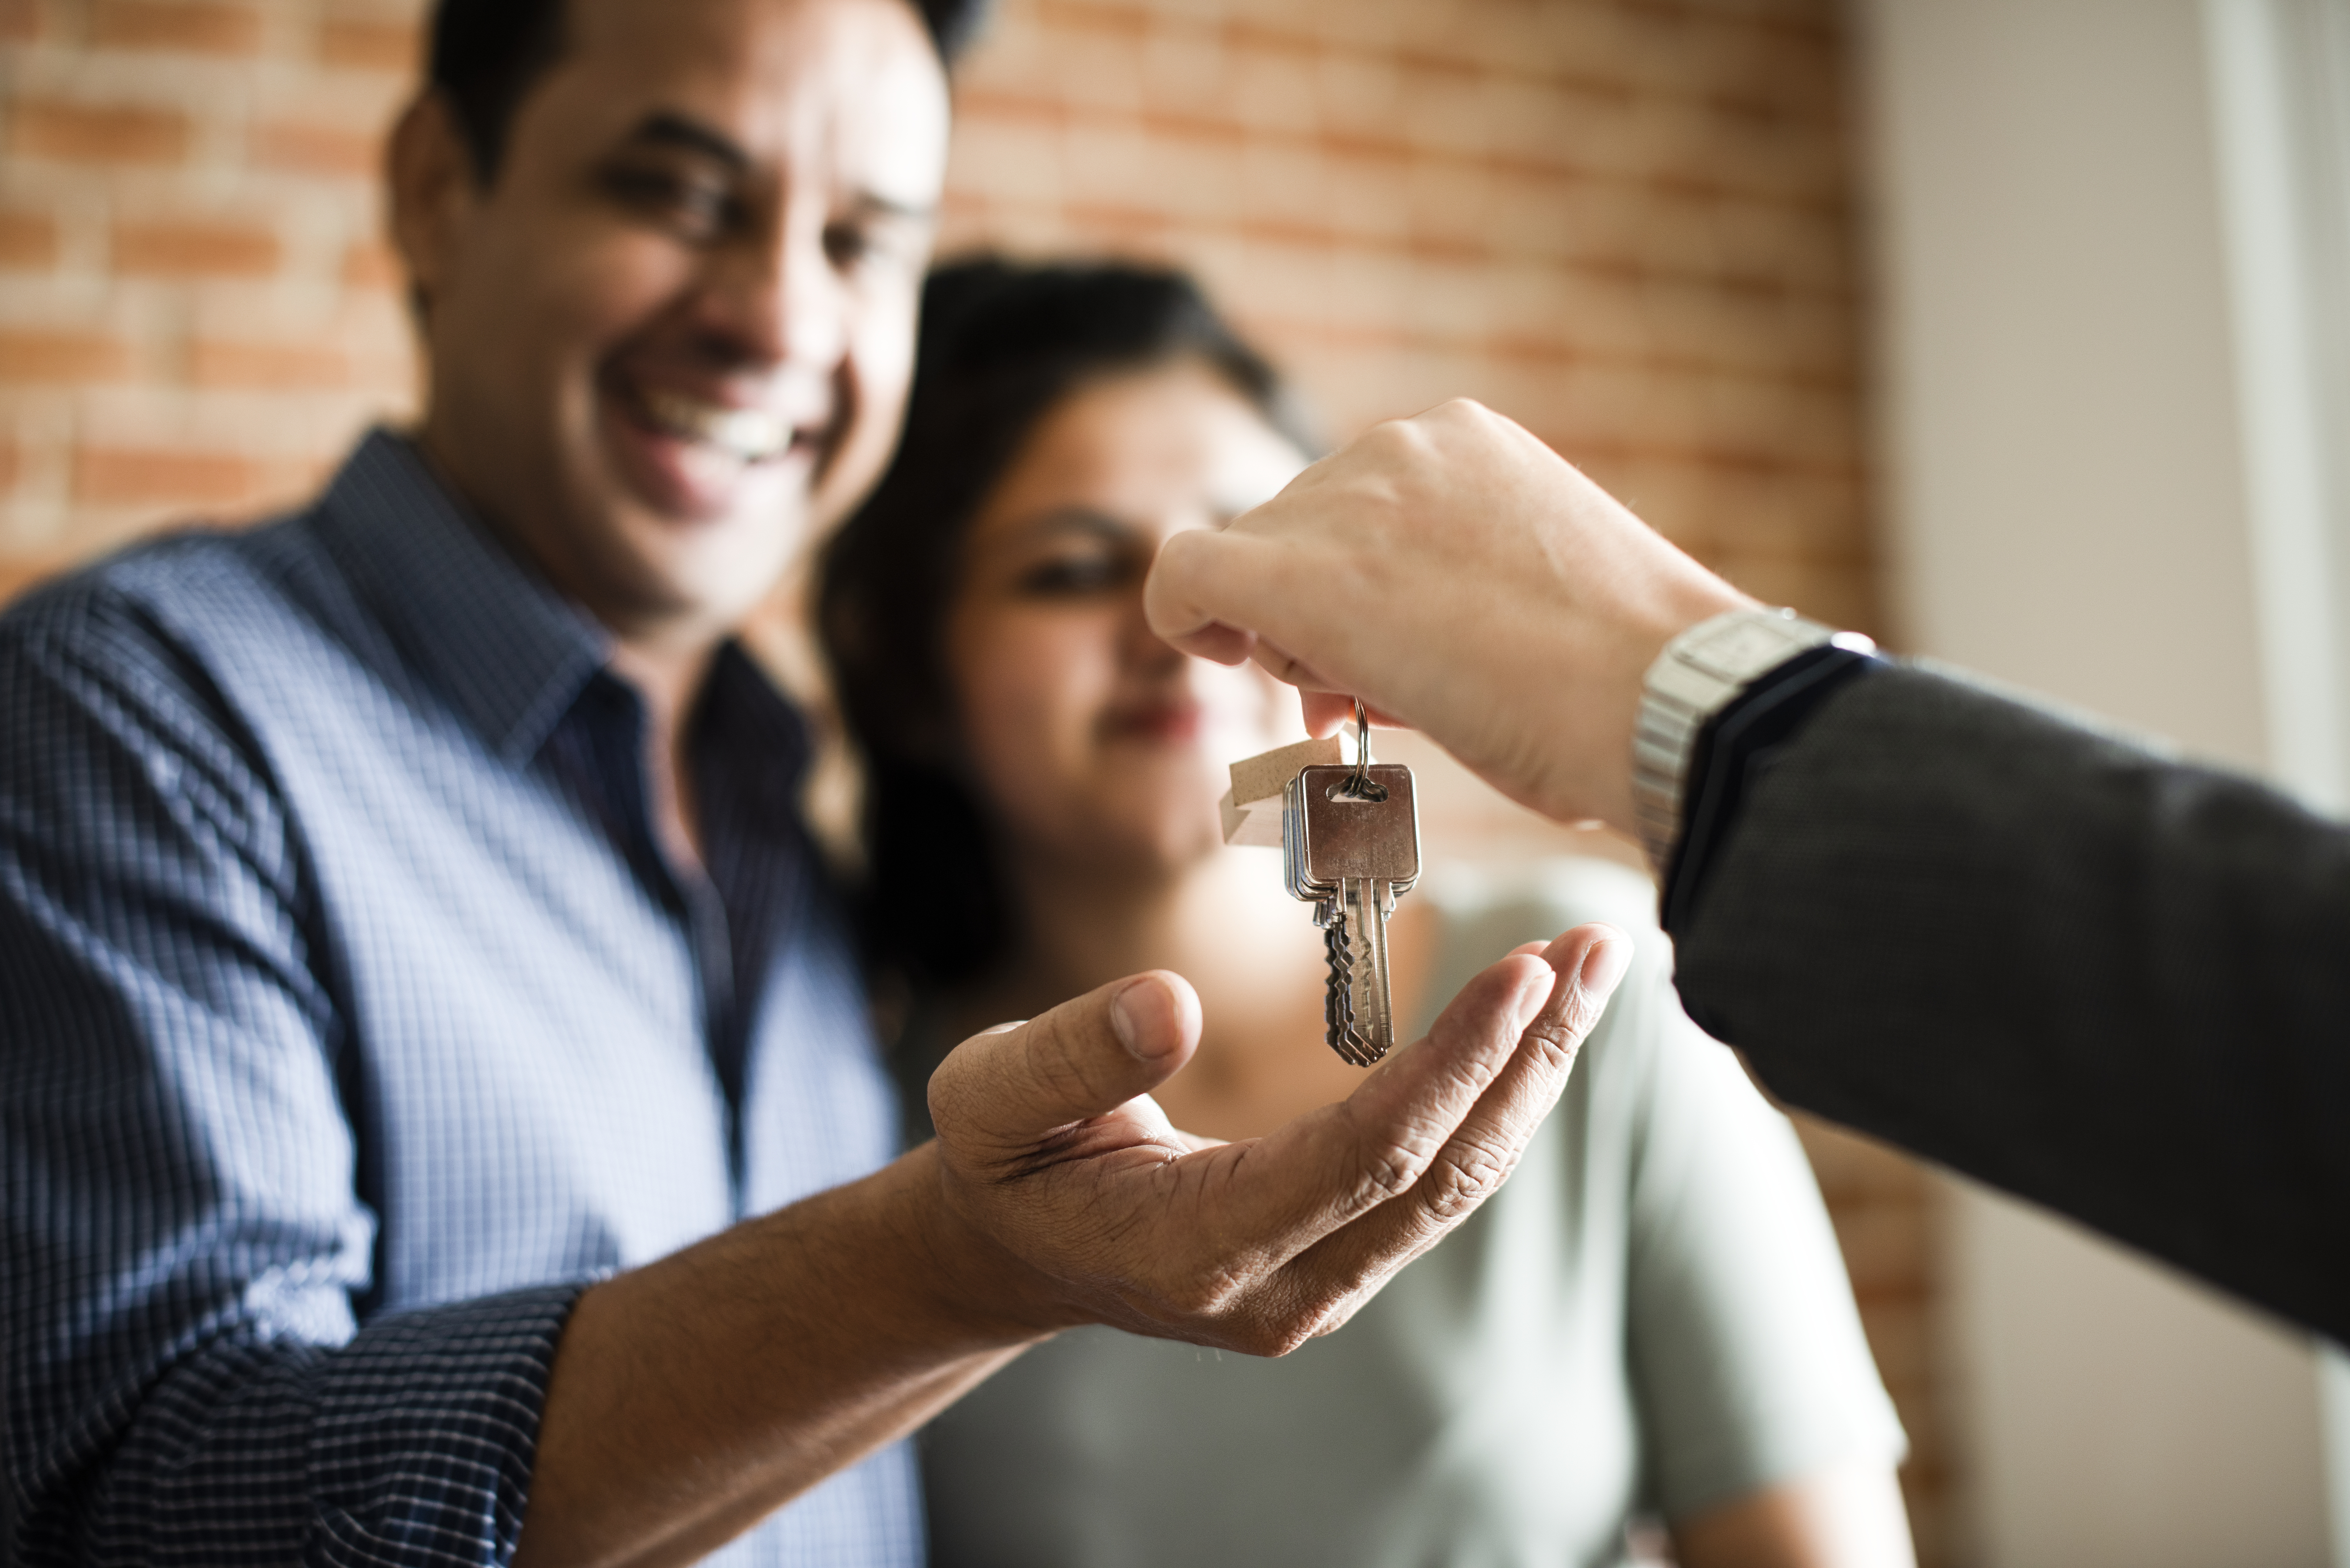 Real Estate Agent Giving Buyer House keys